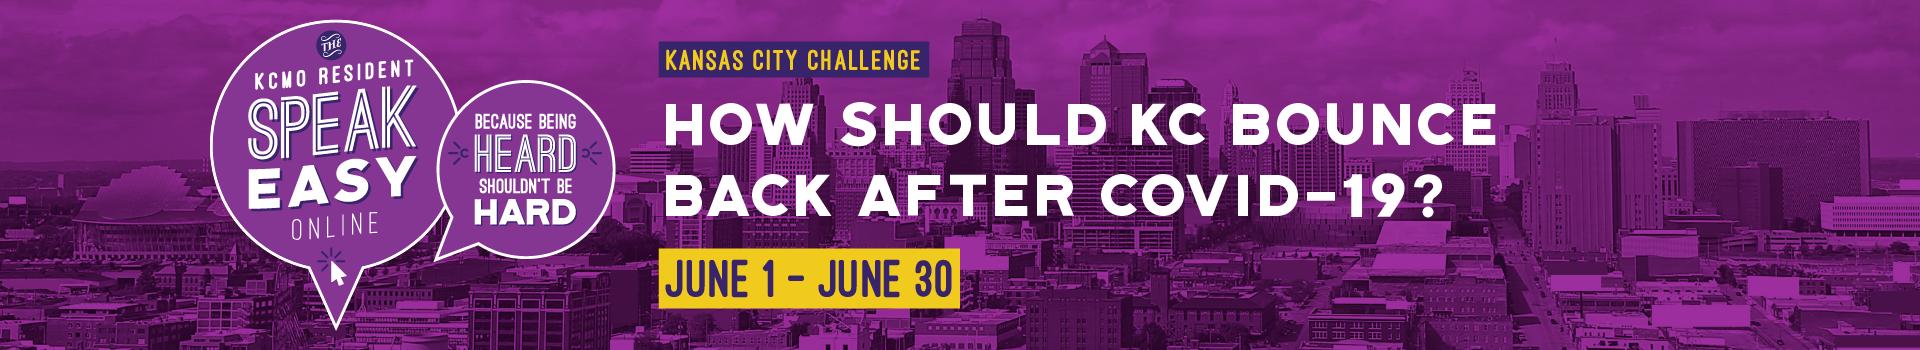 Kansas challenge banner